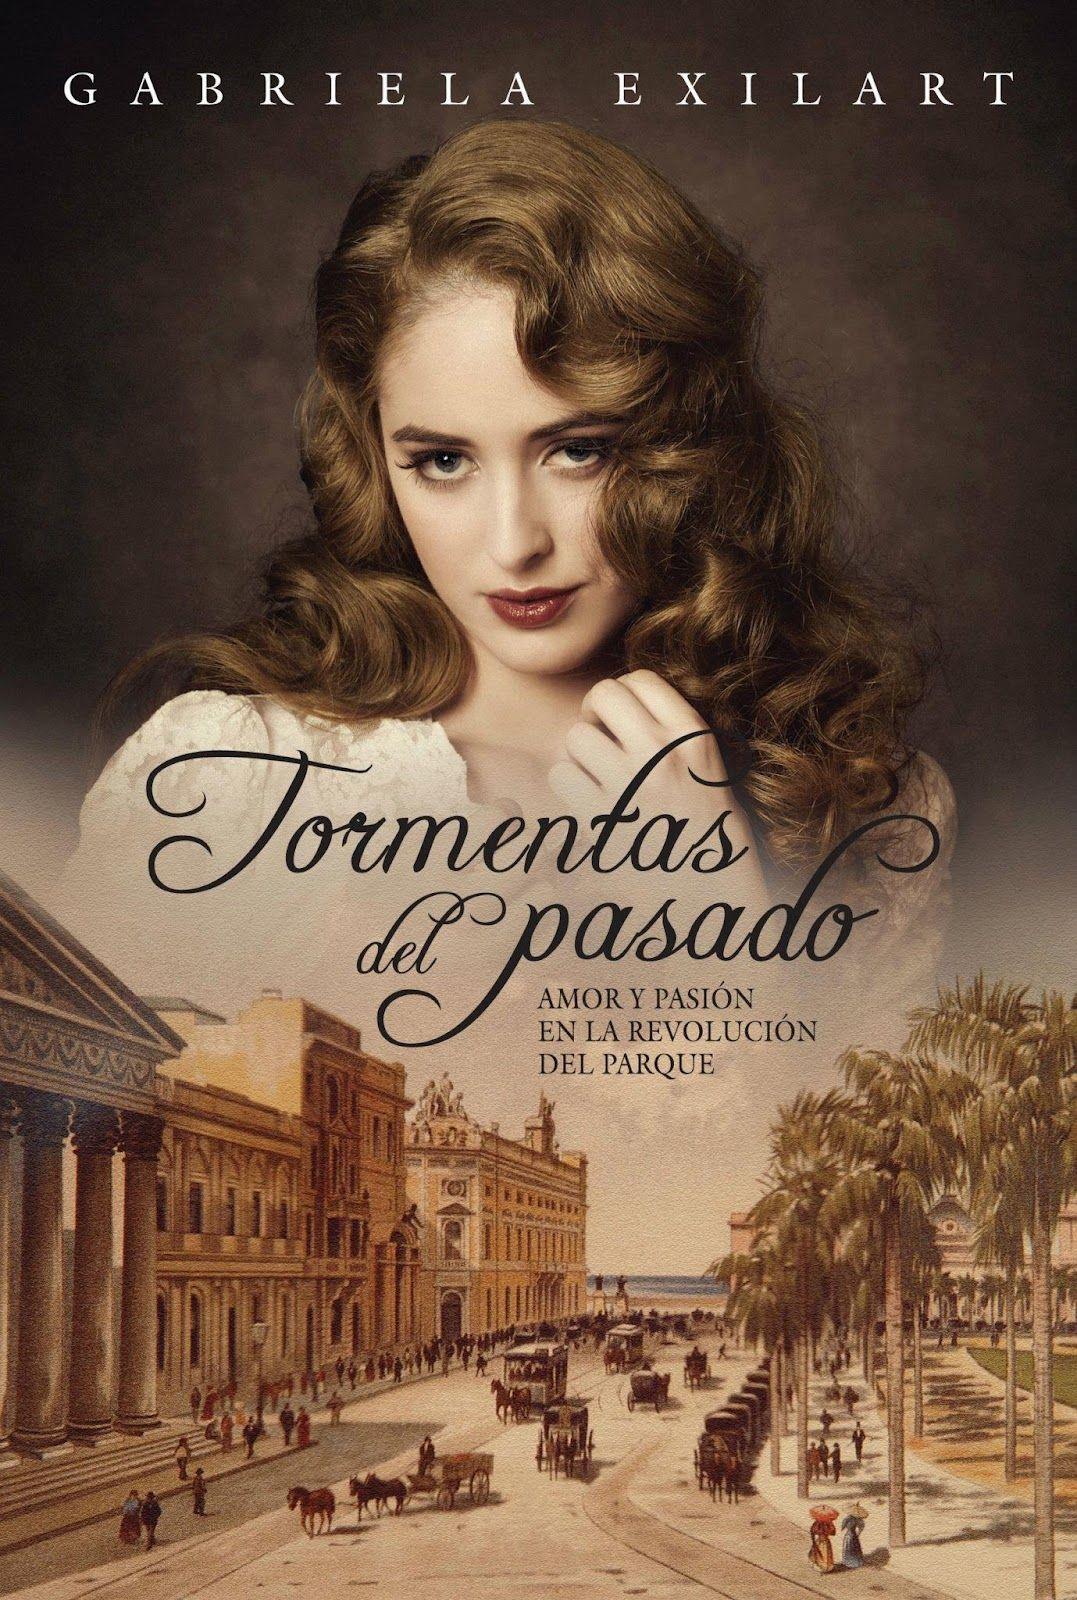 Tormentas Del Pasado Gabriela Exilart Libros Que Voy Leyendo Libros De Misterio Libros De Romance